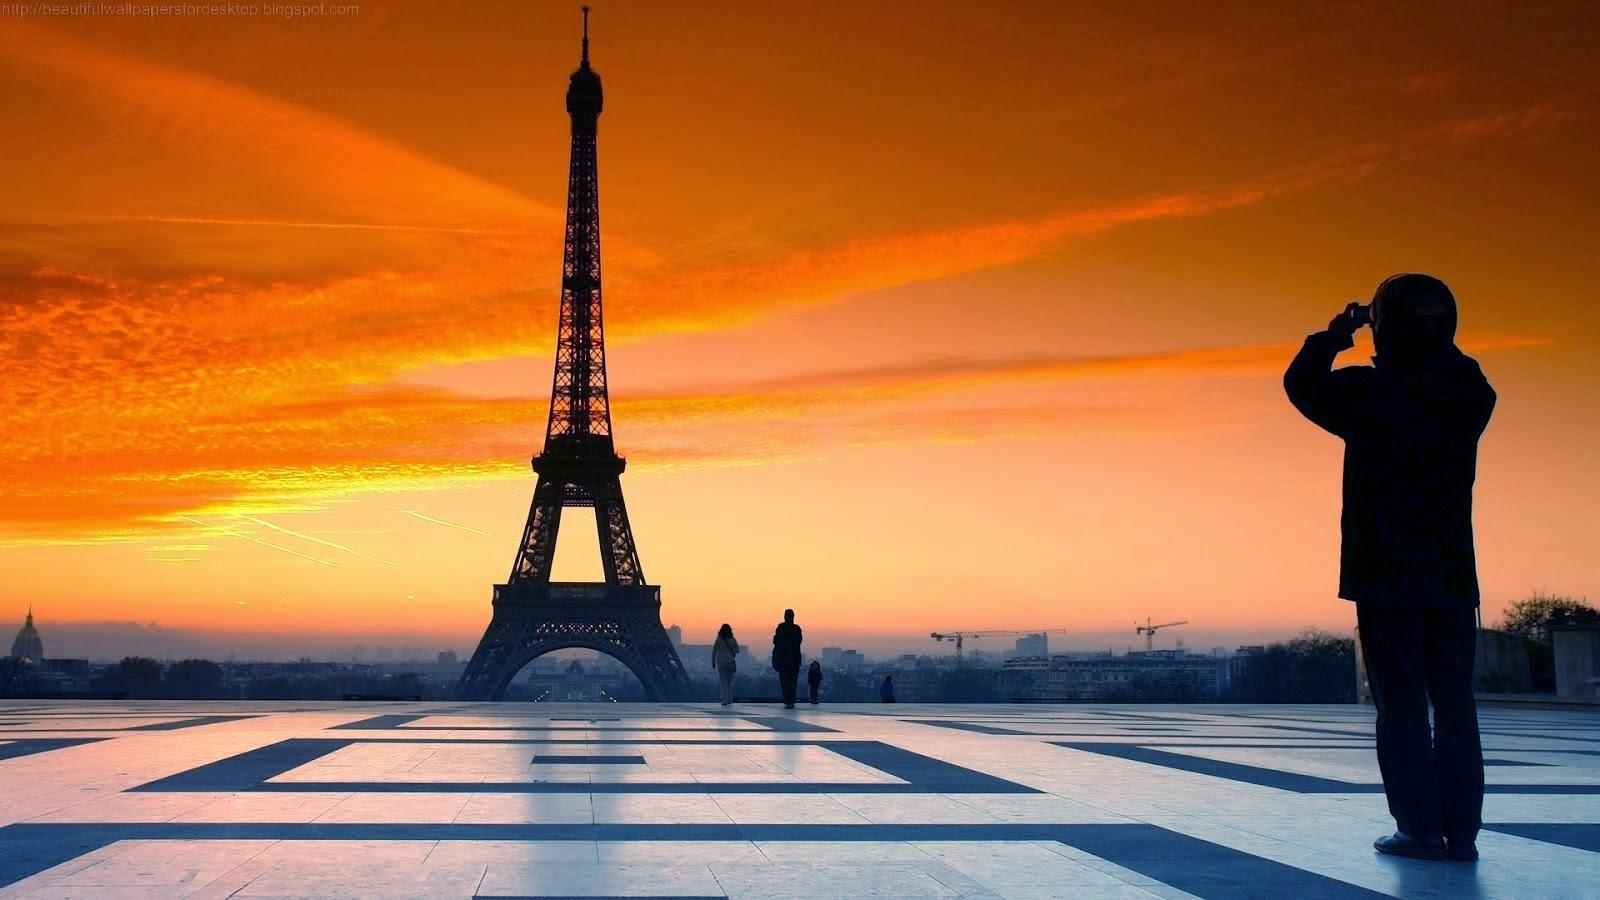 Eiffel Tower Latest Hd Wallpaprs Eiffel Tower Latest 2015